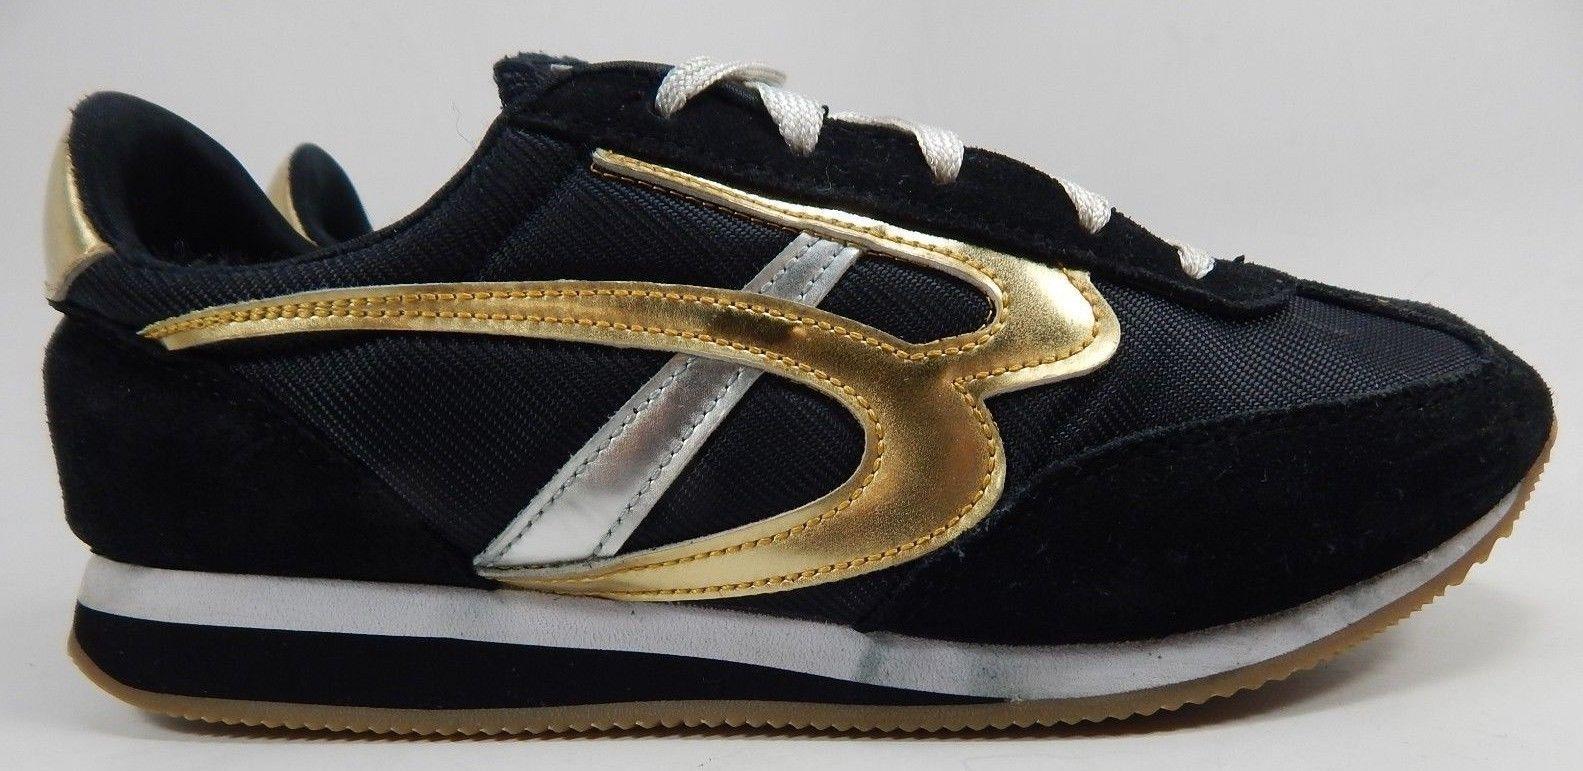 Bobs Hollywood Fashion Sneaker Suede Women's Size US 8 M (B) EU 38 Black / Gold